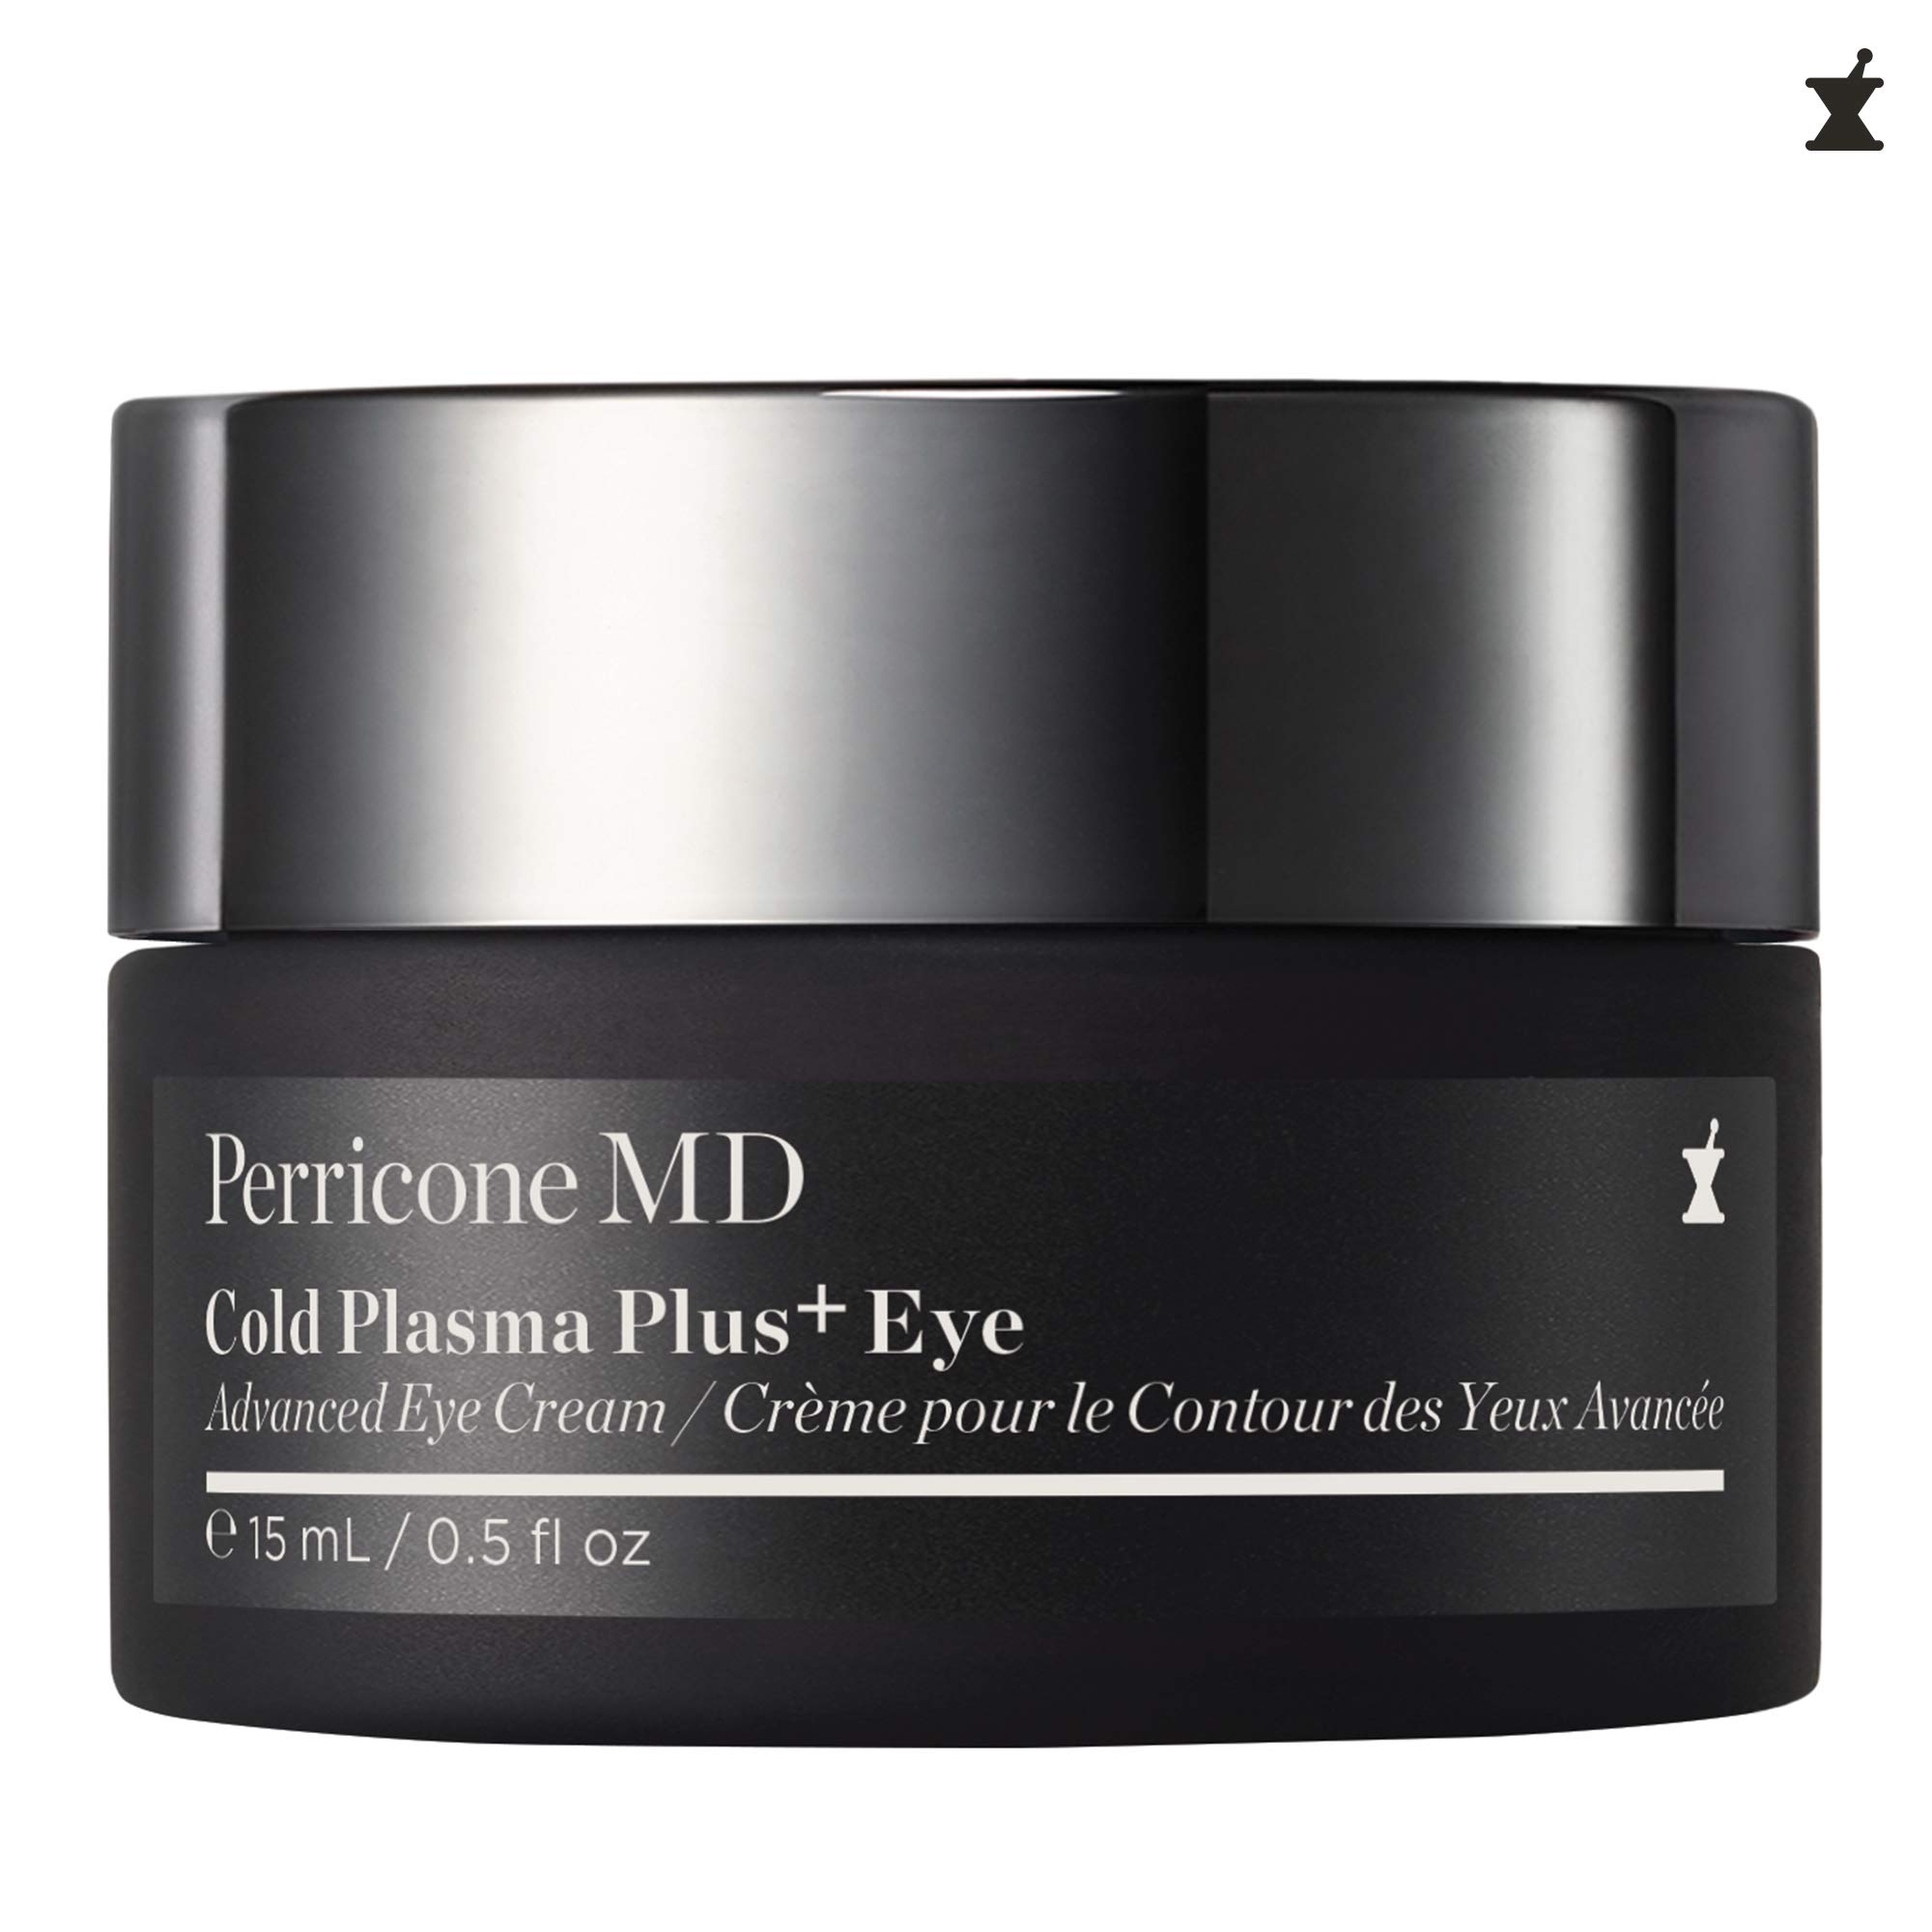 Perricone M.D. - Cold Plasma Plus+ Eye - Natural Hydrating Eye Cream